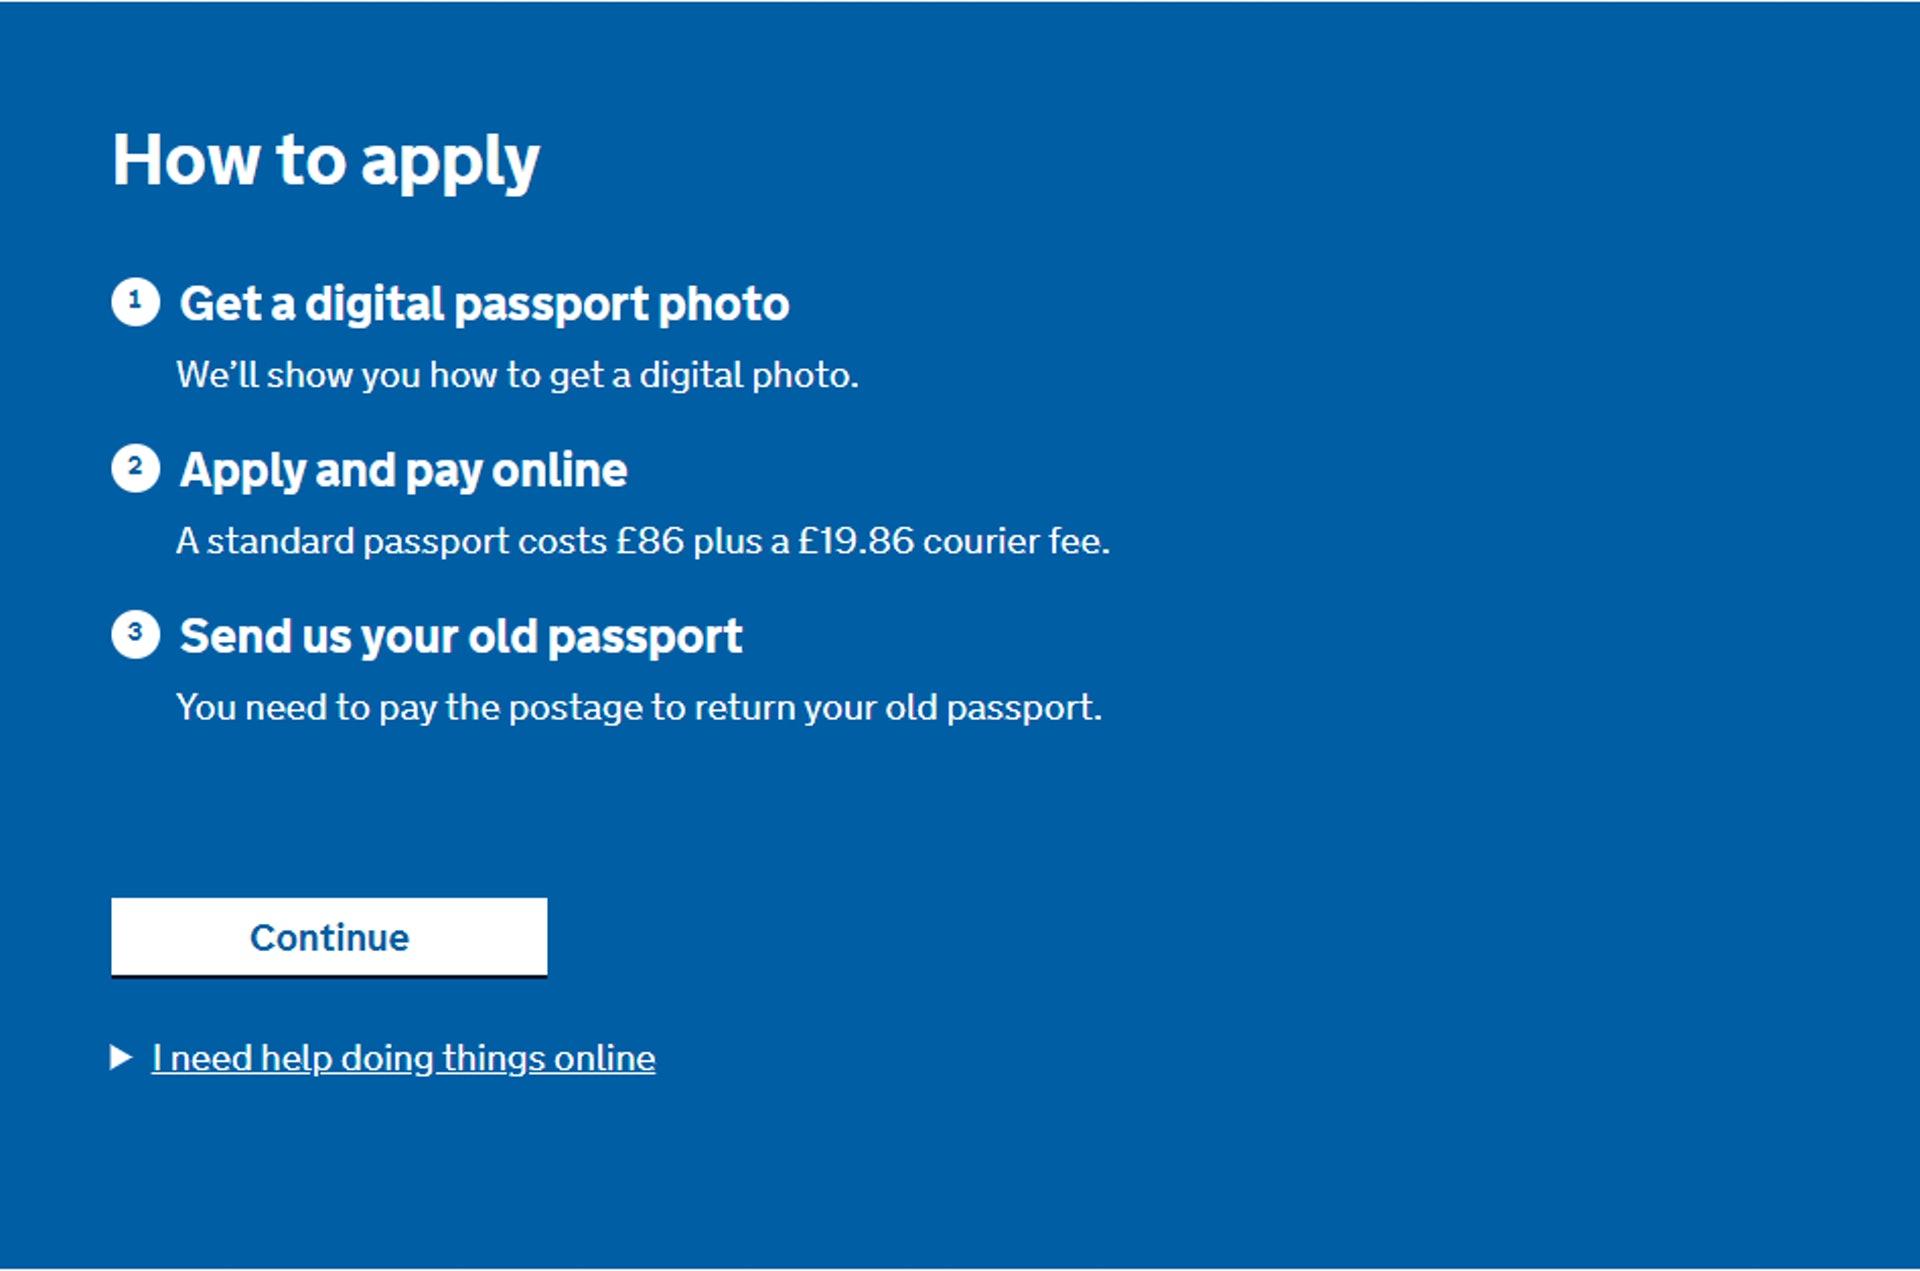 BNO申請步驟教學(GOV.UK 網站截圖)